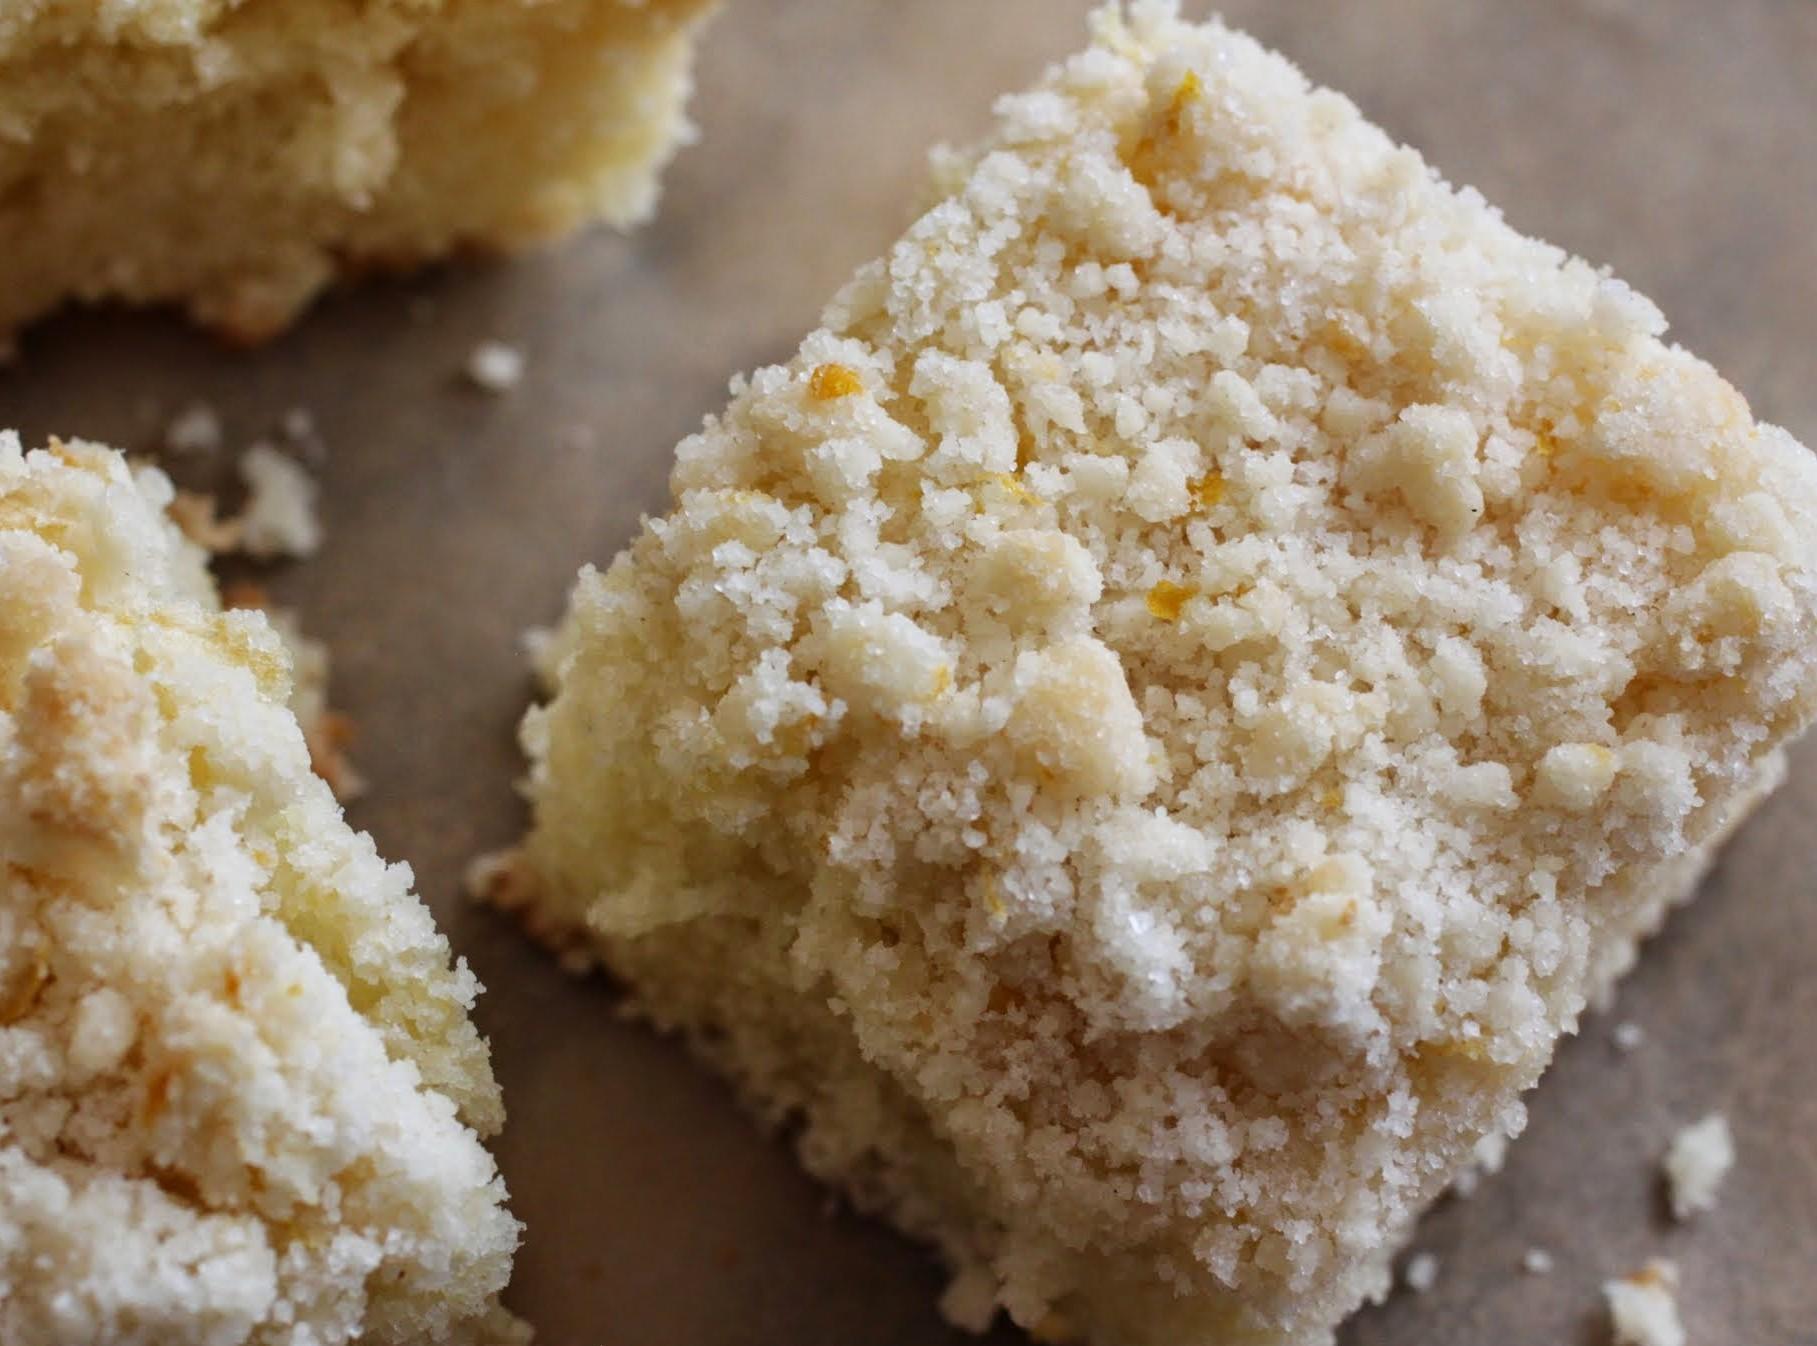 Meyer Lemon Crumb Cake